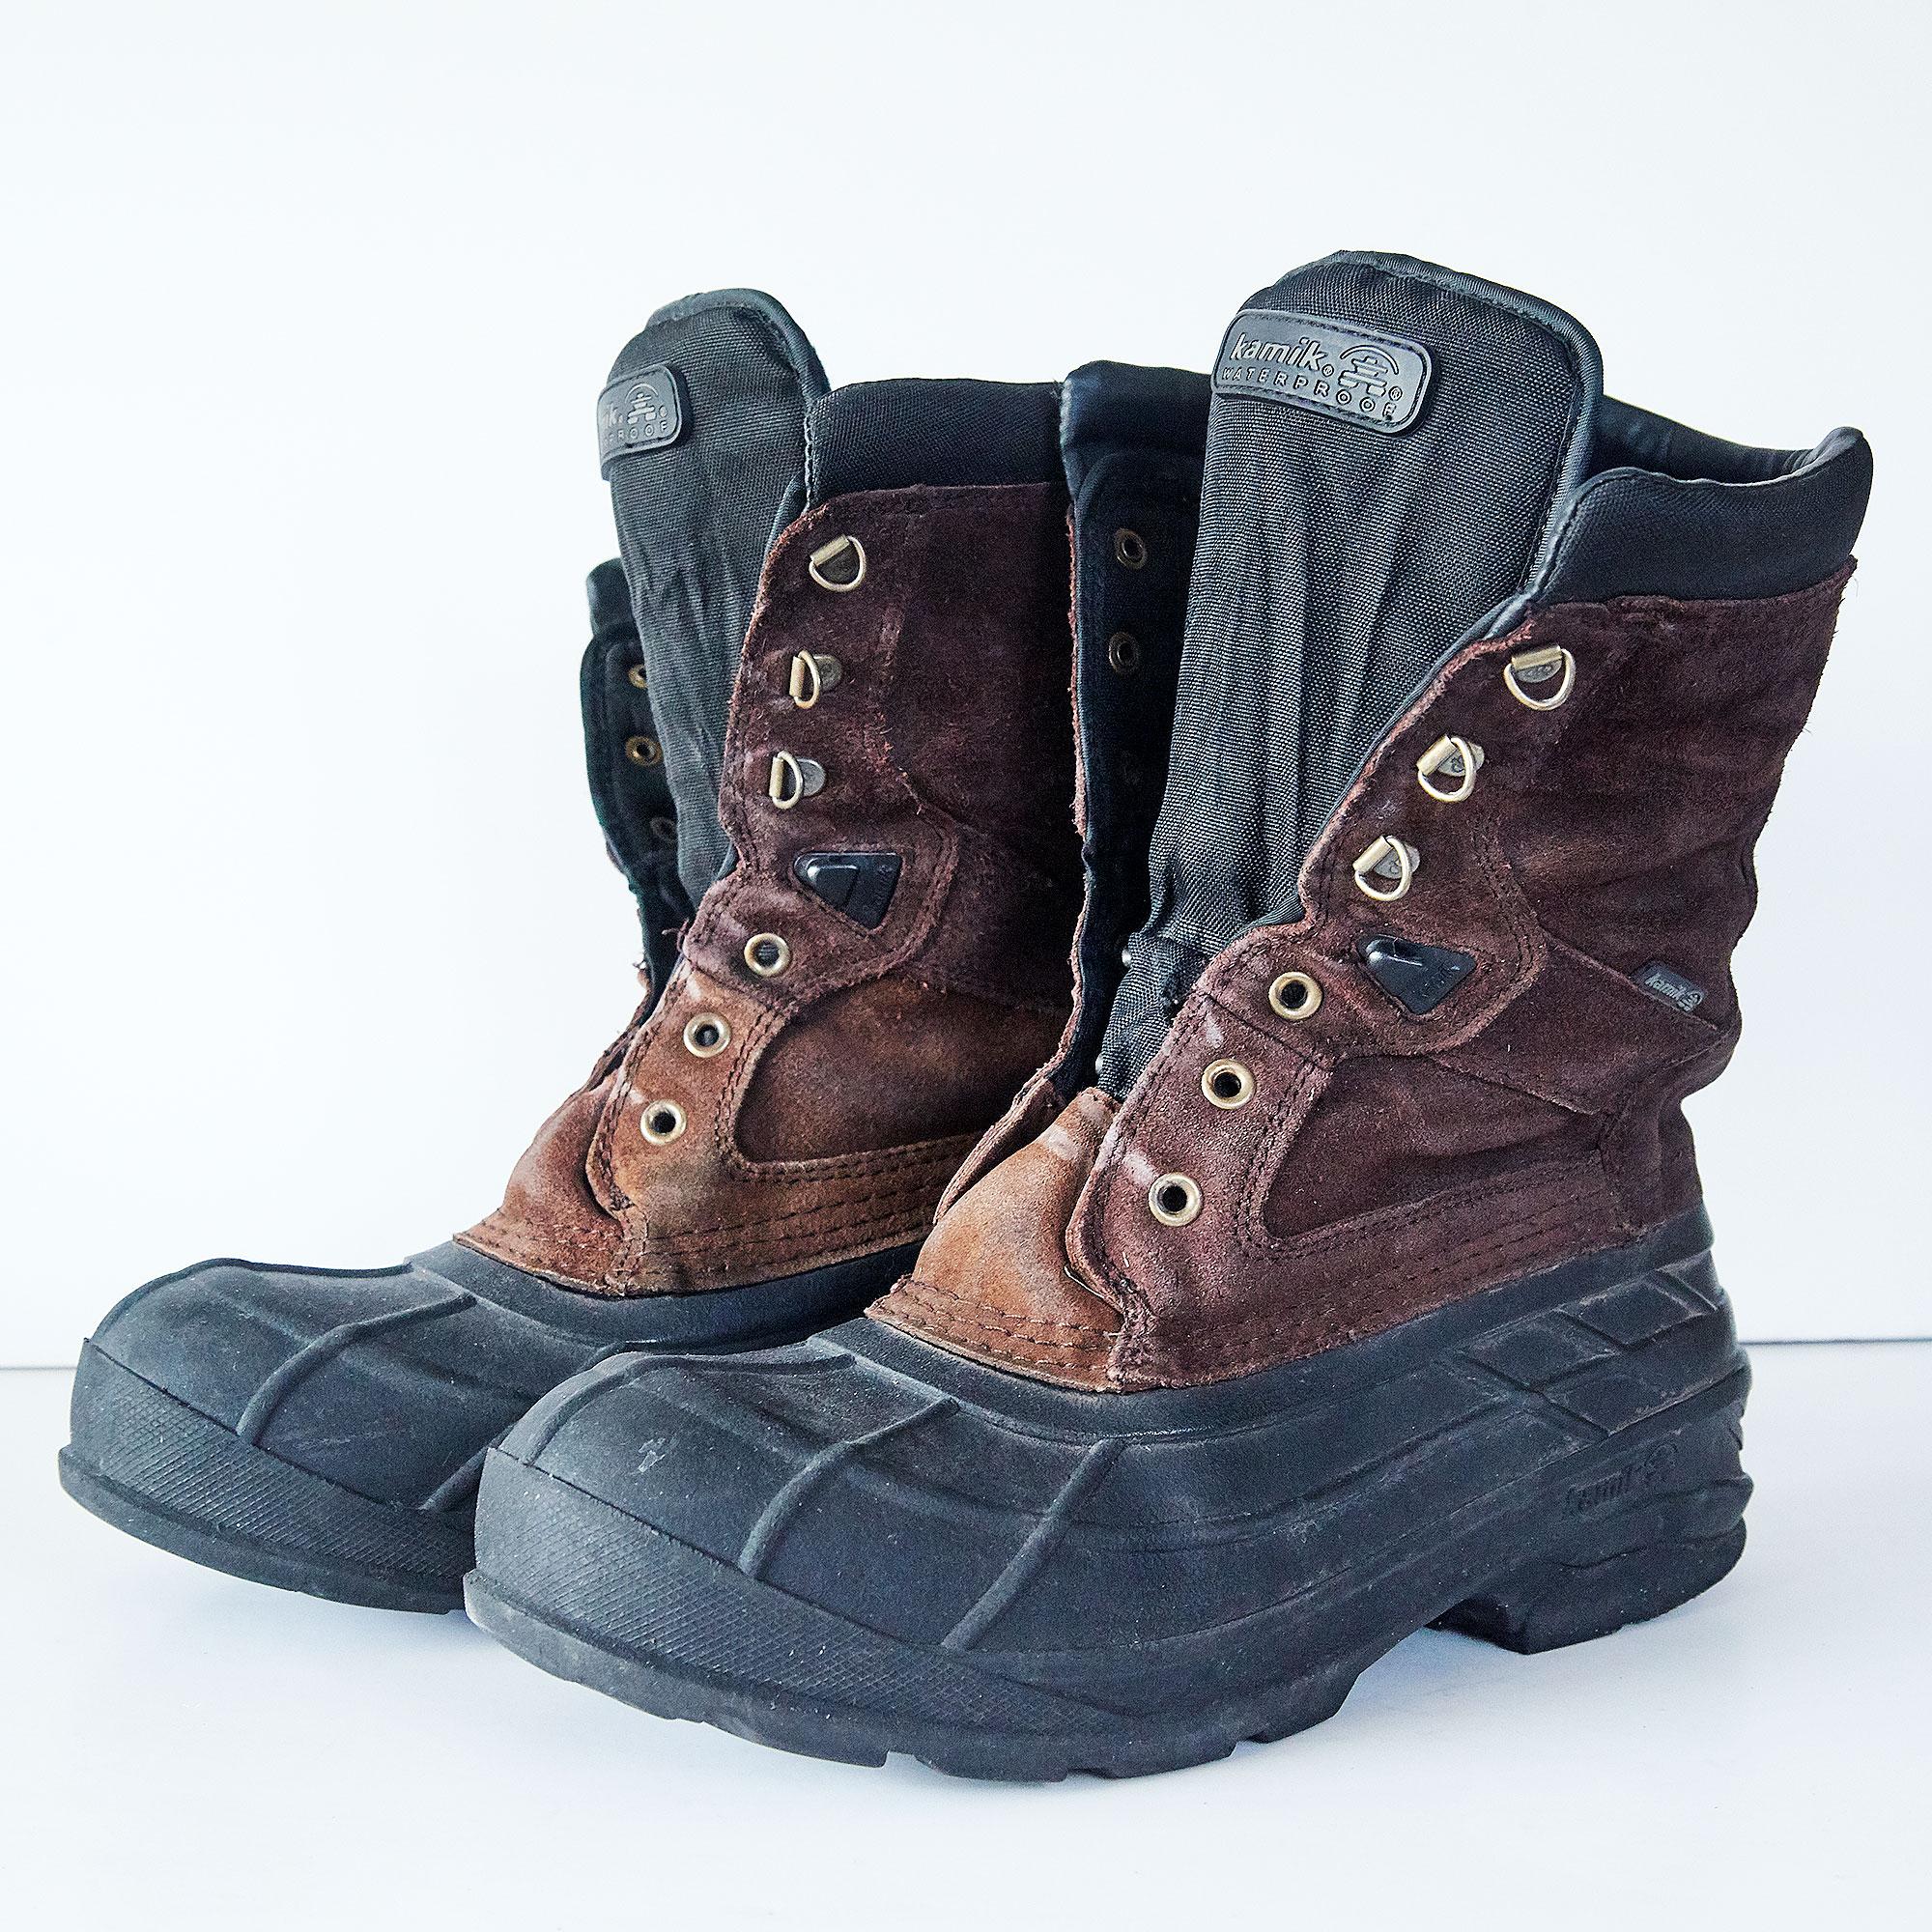 kamik nation plus boots ~ after three seasons